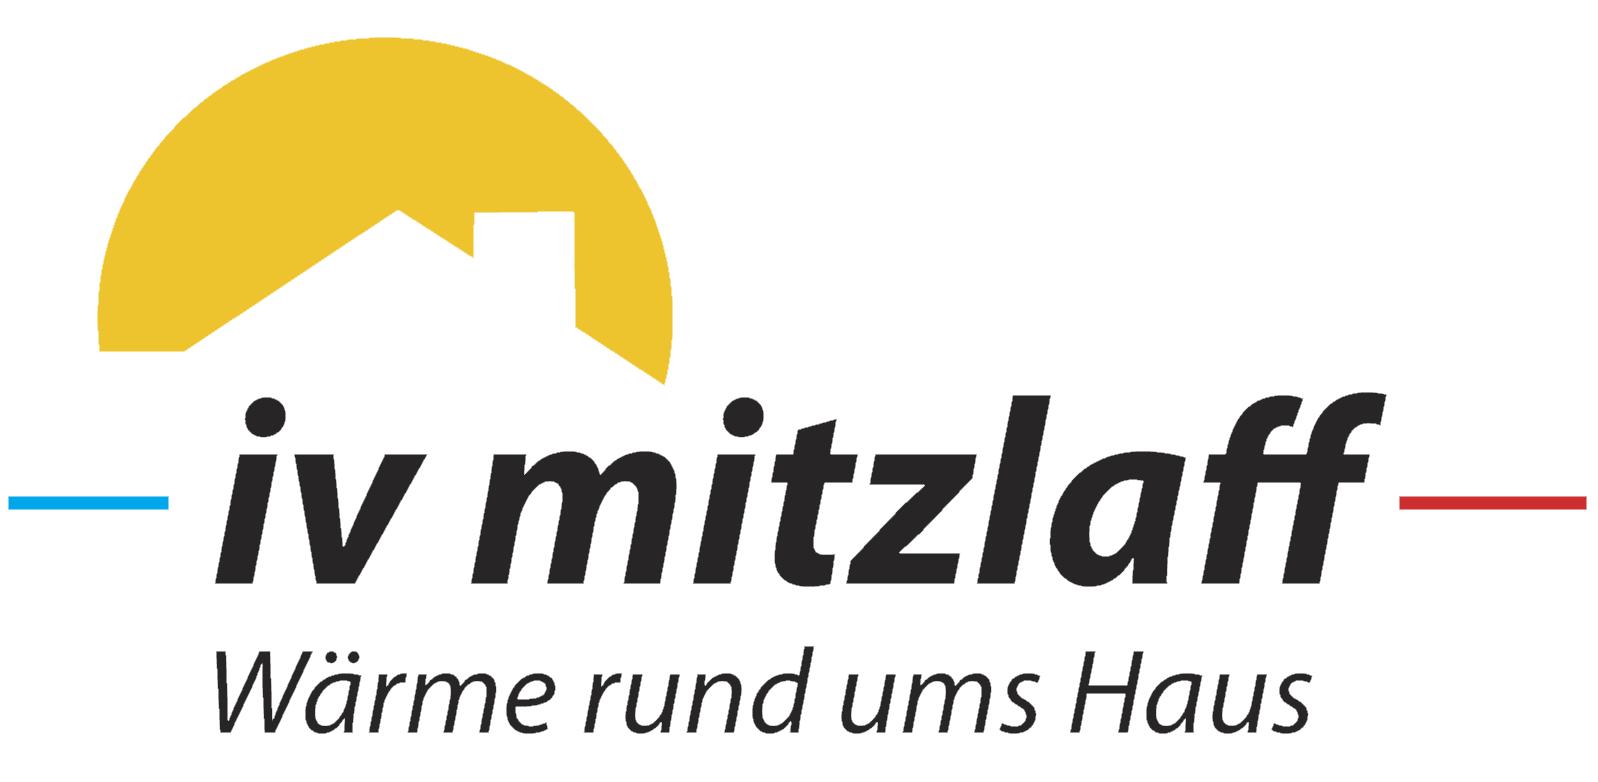 IVMitzlaff-non_transp